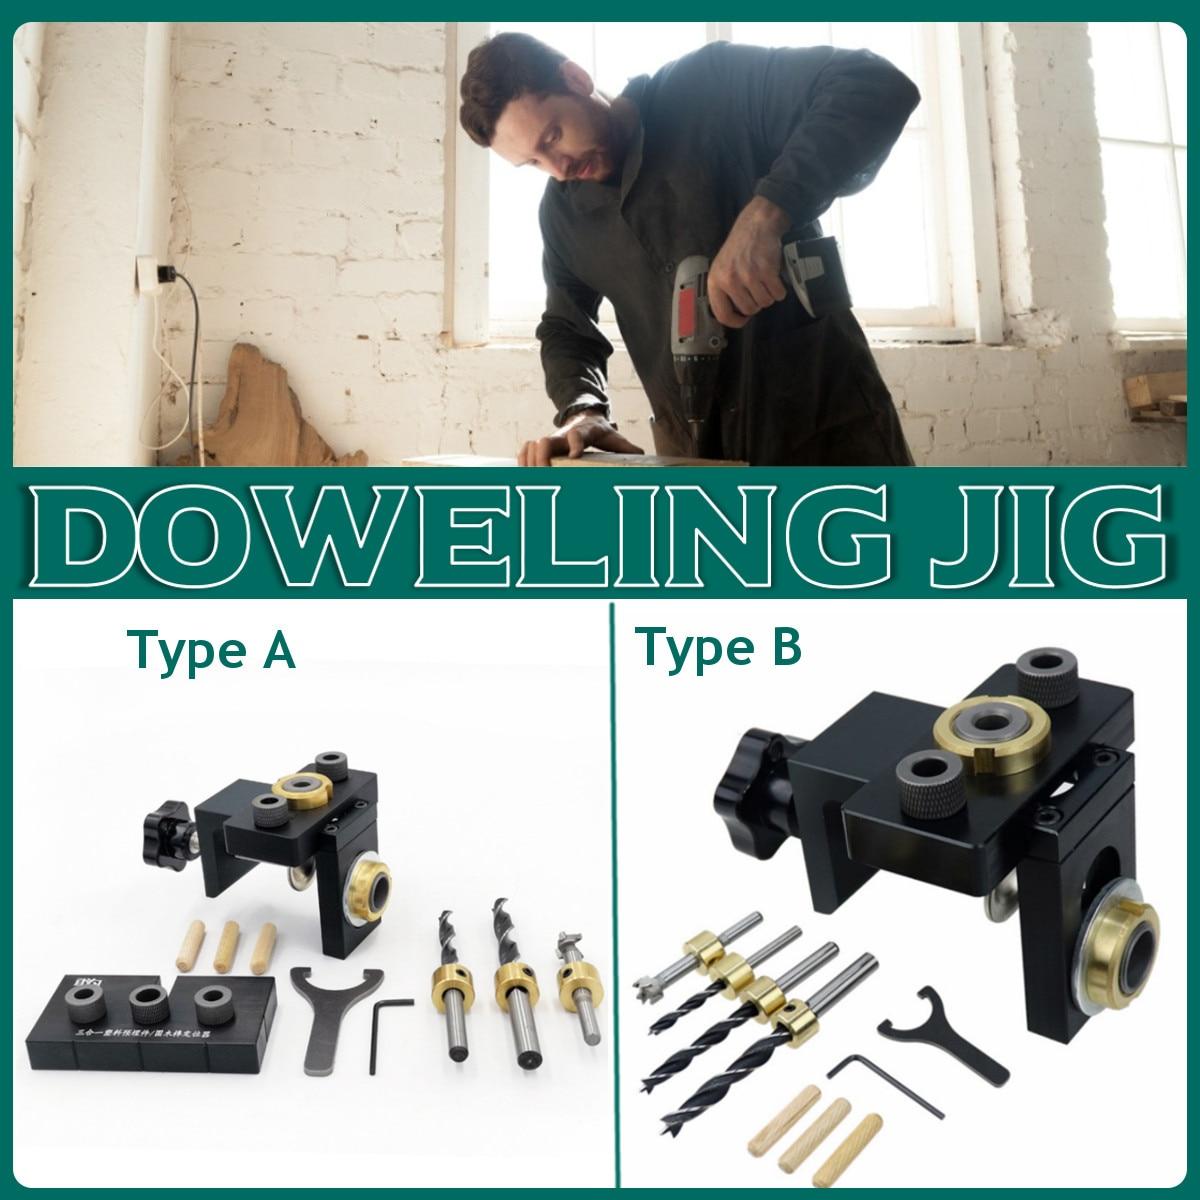 Doweling Jig Pocket Hole Jig Kit Wood Vertical Drilling Detachable Locator For Furniture Connecting Hole Puncher Carpentry DIY